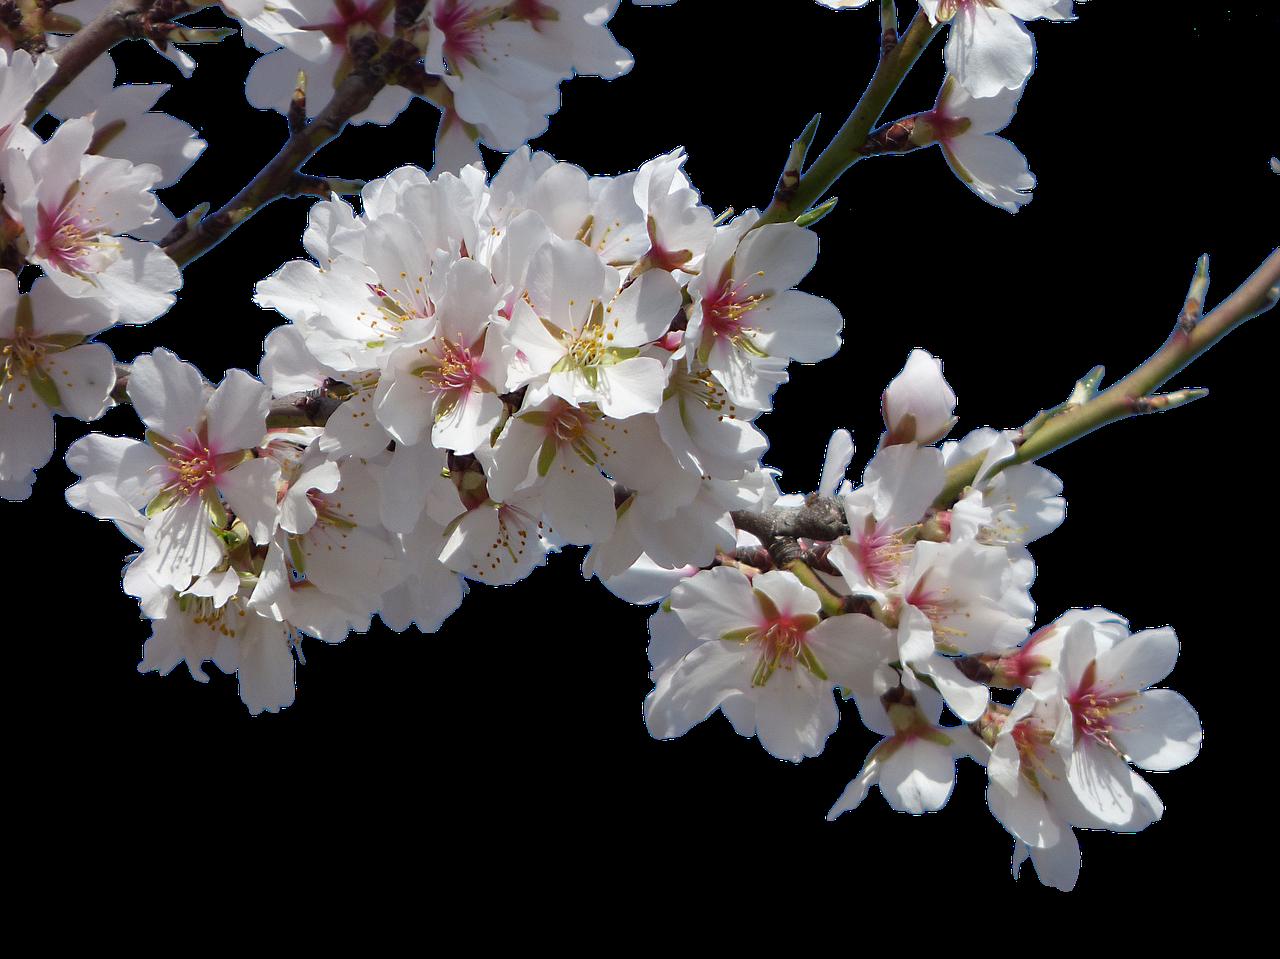 Яблони в цвету картинки на прозрачном фоне, ден